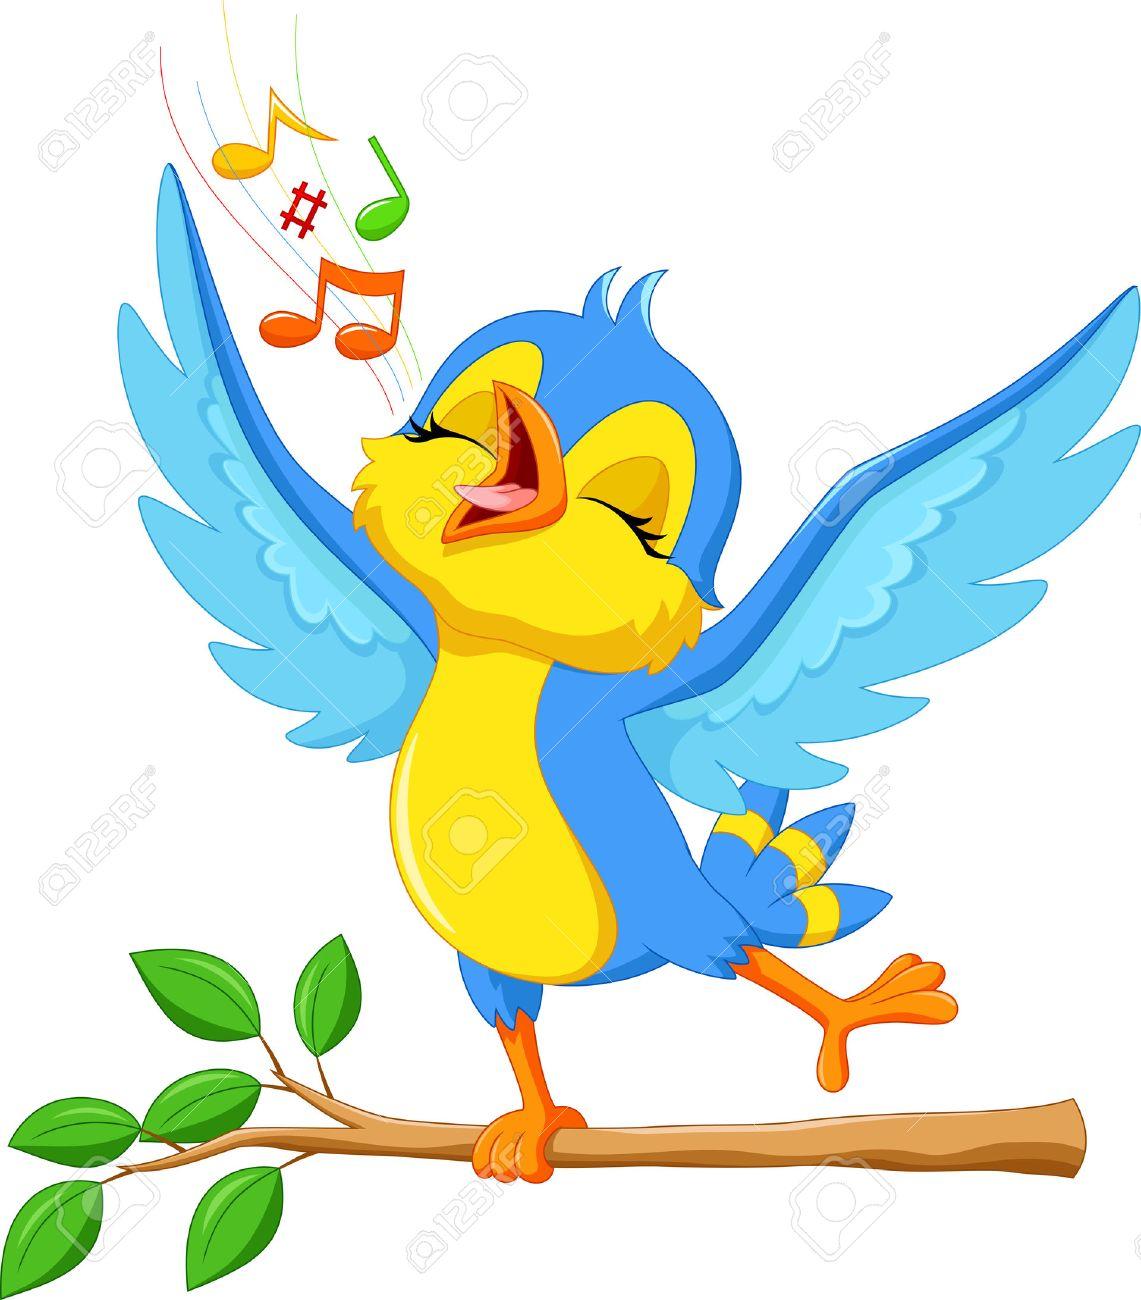 illustration of cute bird singing - 52210780